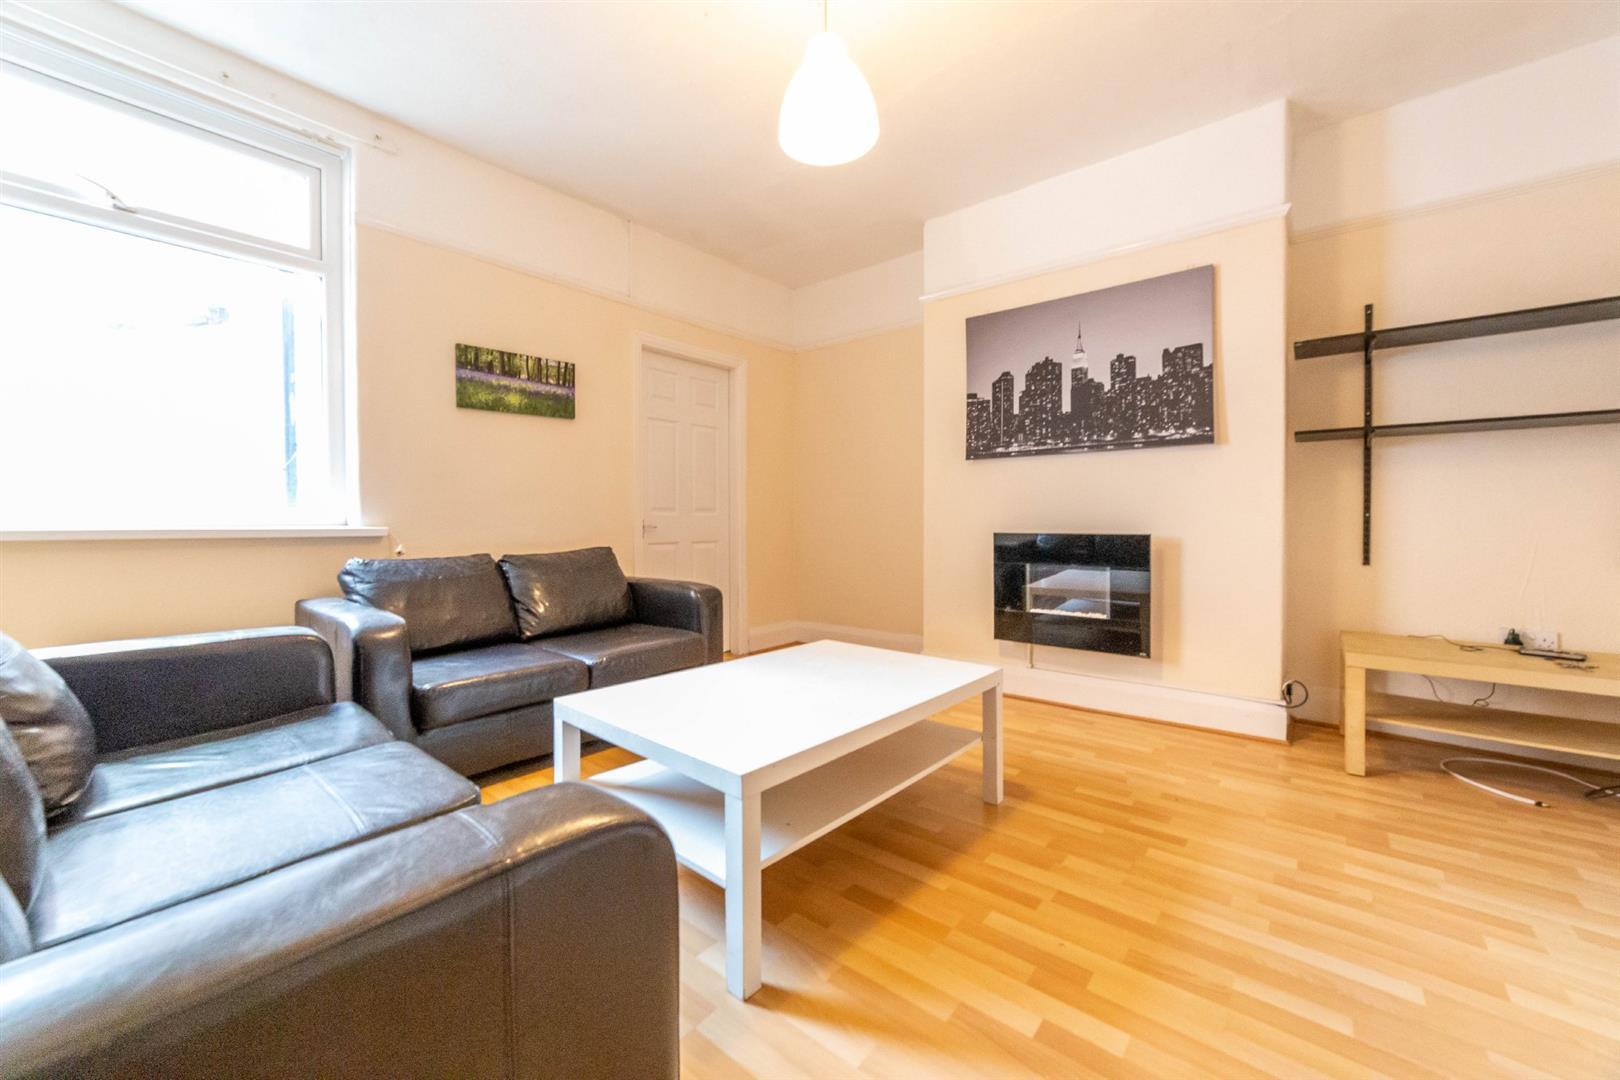 2 bed flat to rent in Newcastle Upon Tyne, NE6 5TB, NE6